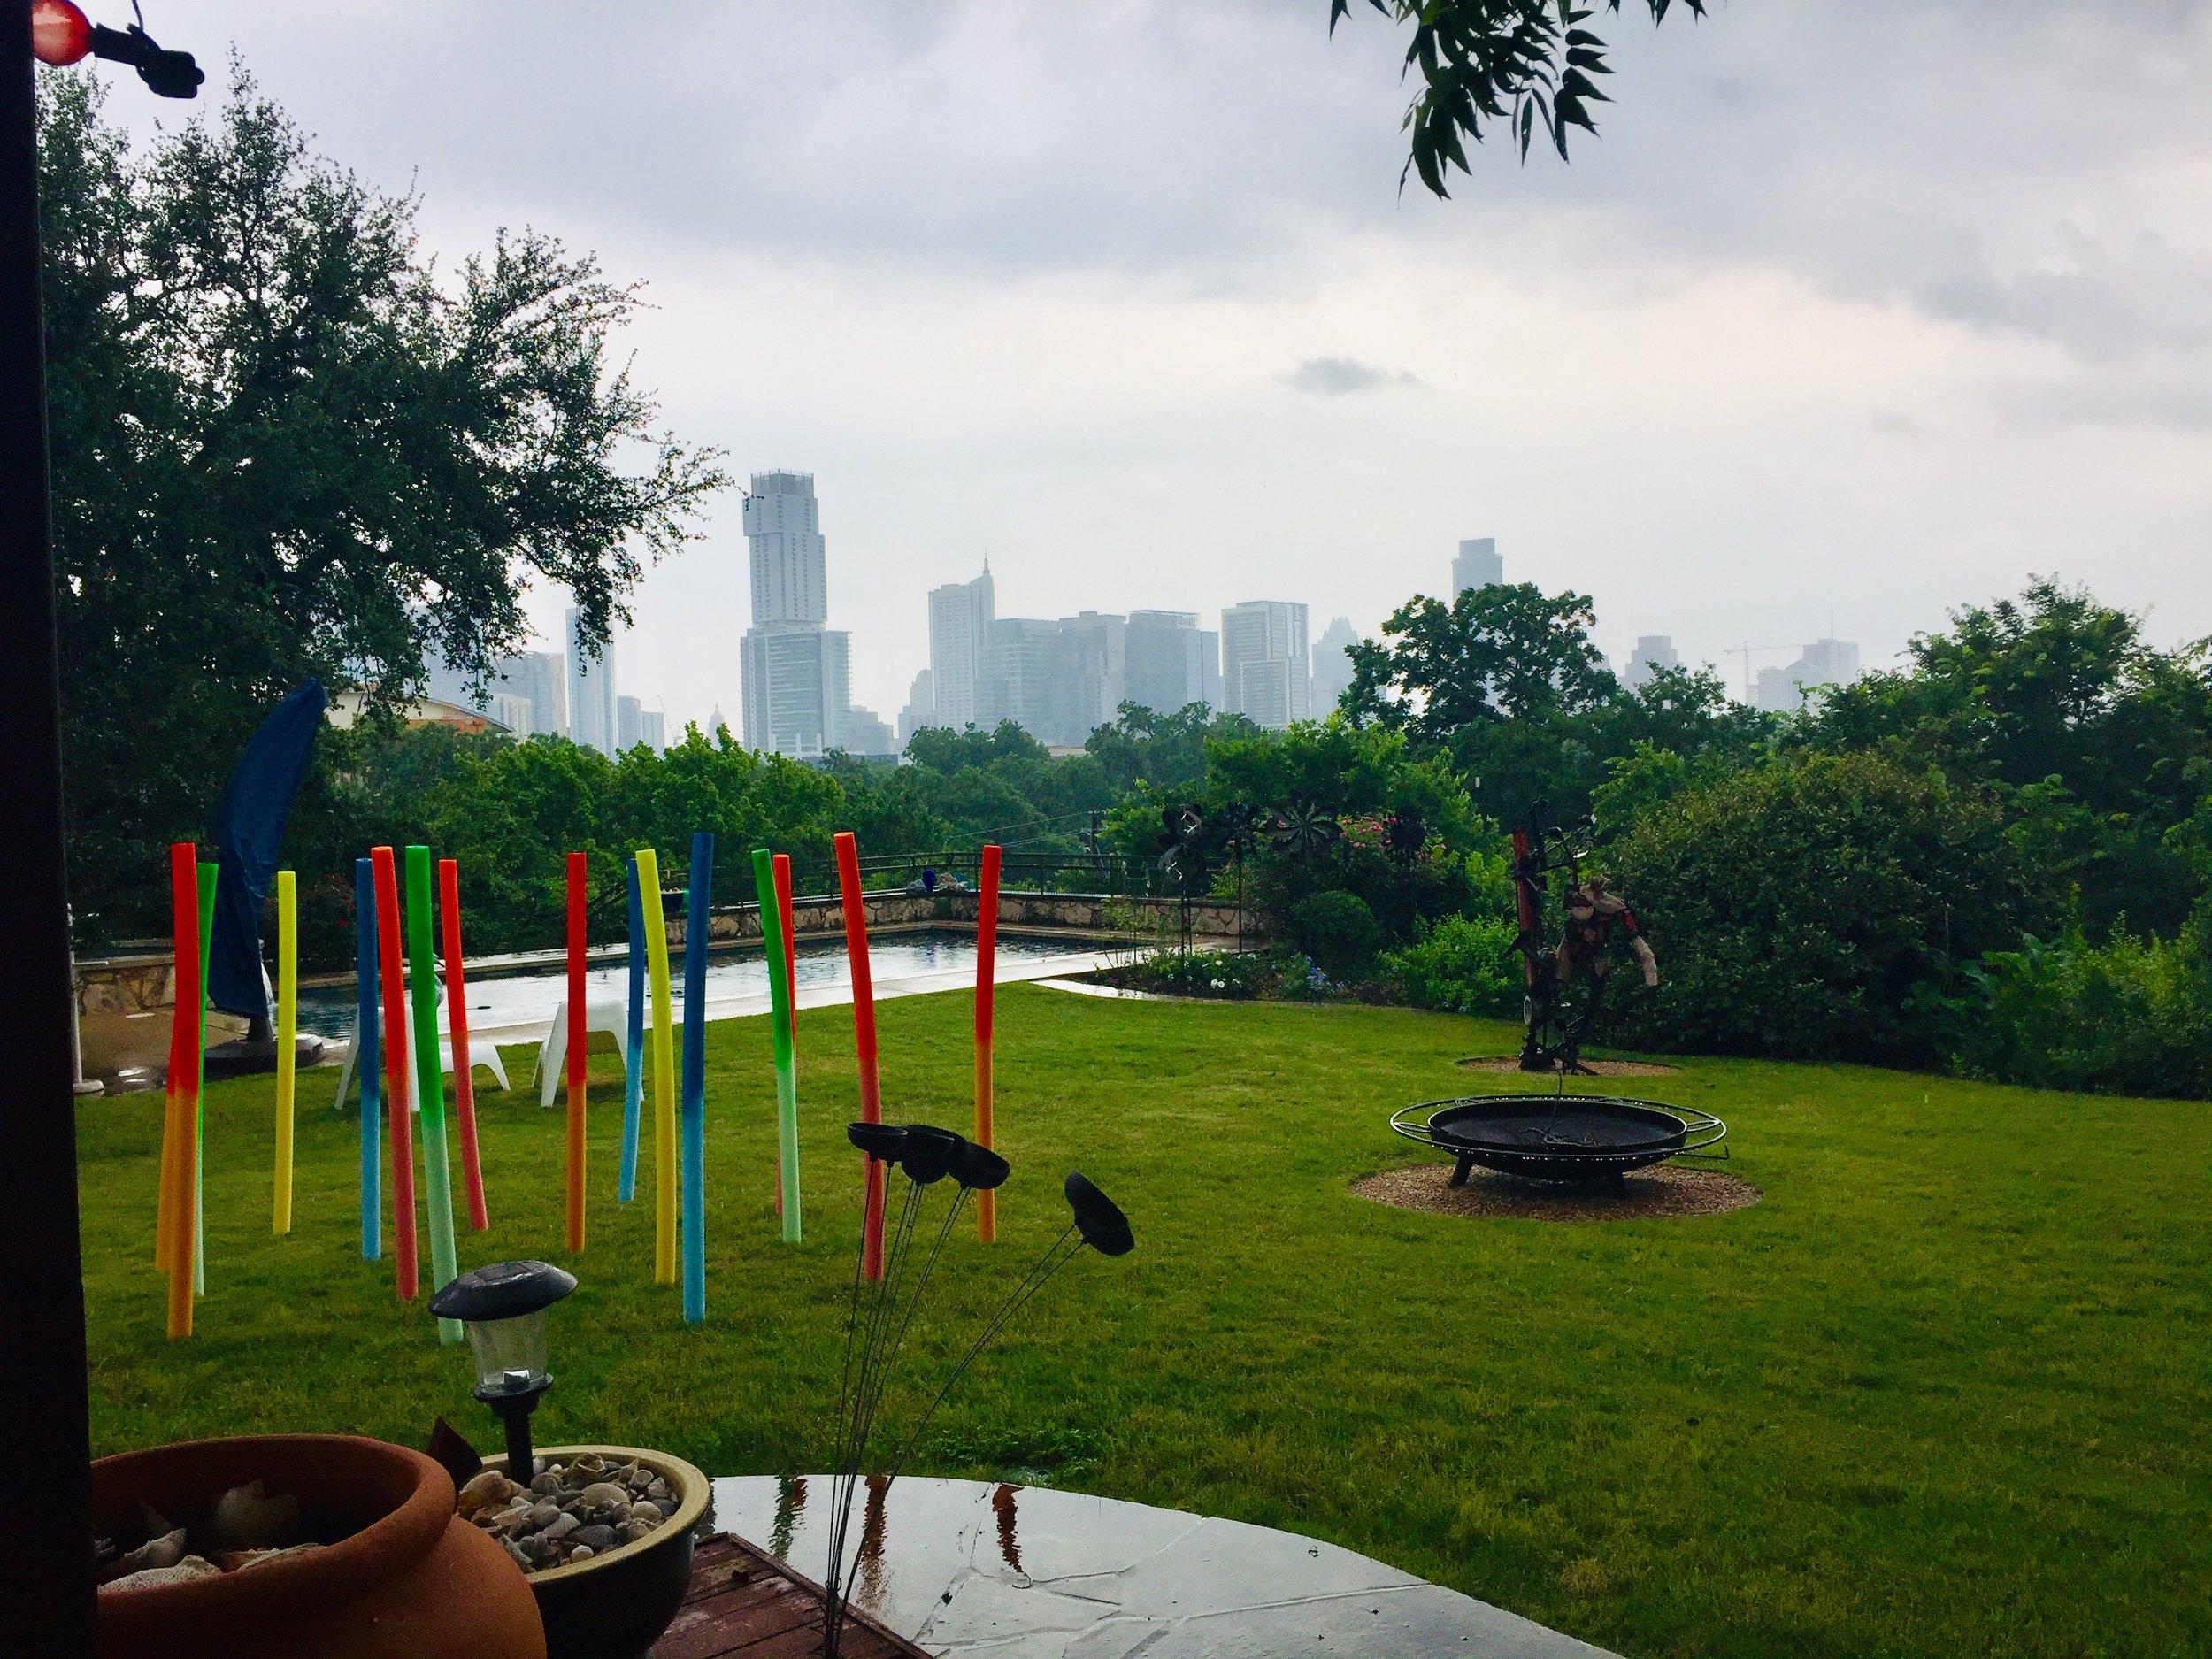 Neon Grasses - outdoors - WEST 2019 -  1 - Hallie Rae Ward.JPG